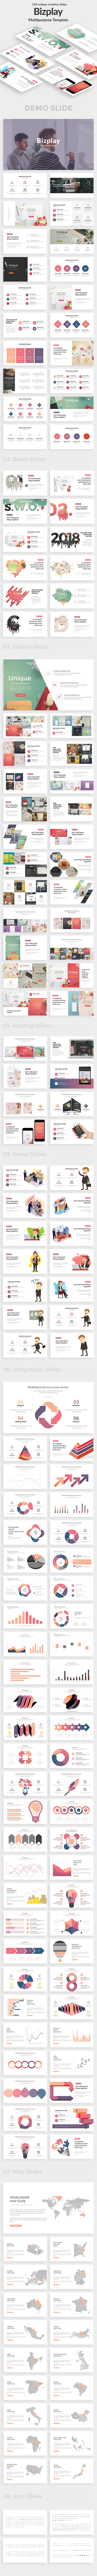 Bizplay Multipurpose Powerpoint Template - Creative PowerPoint Templates